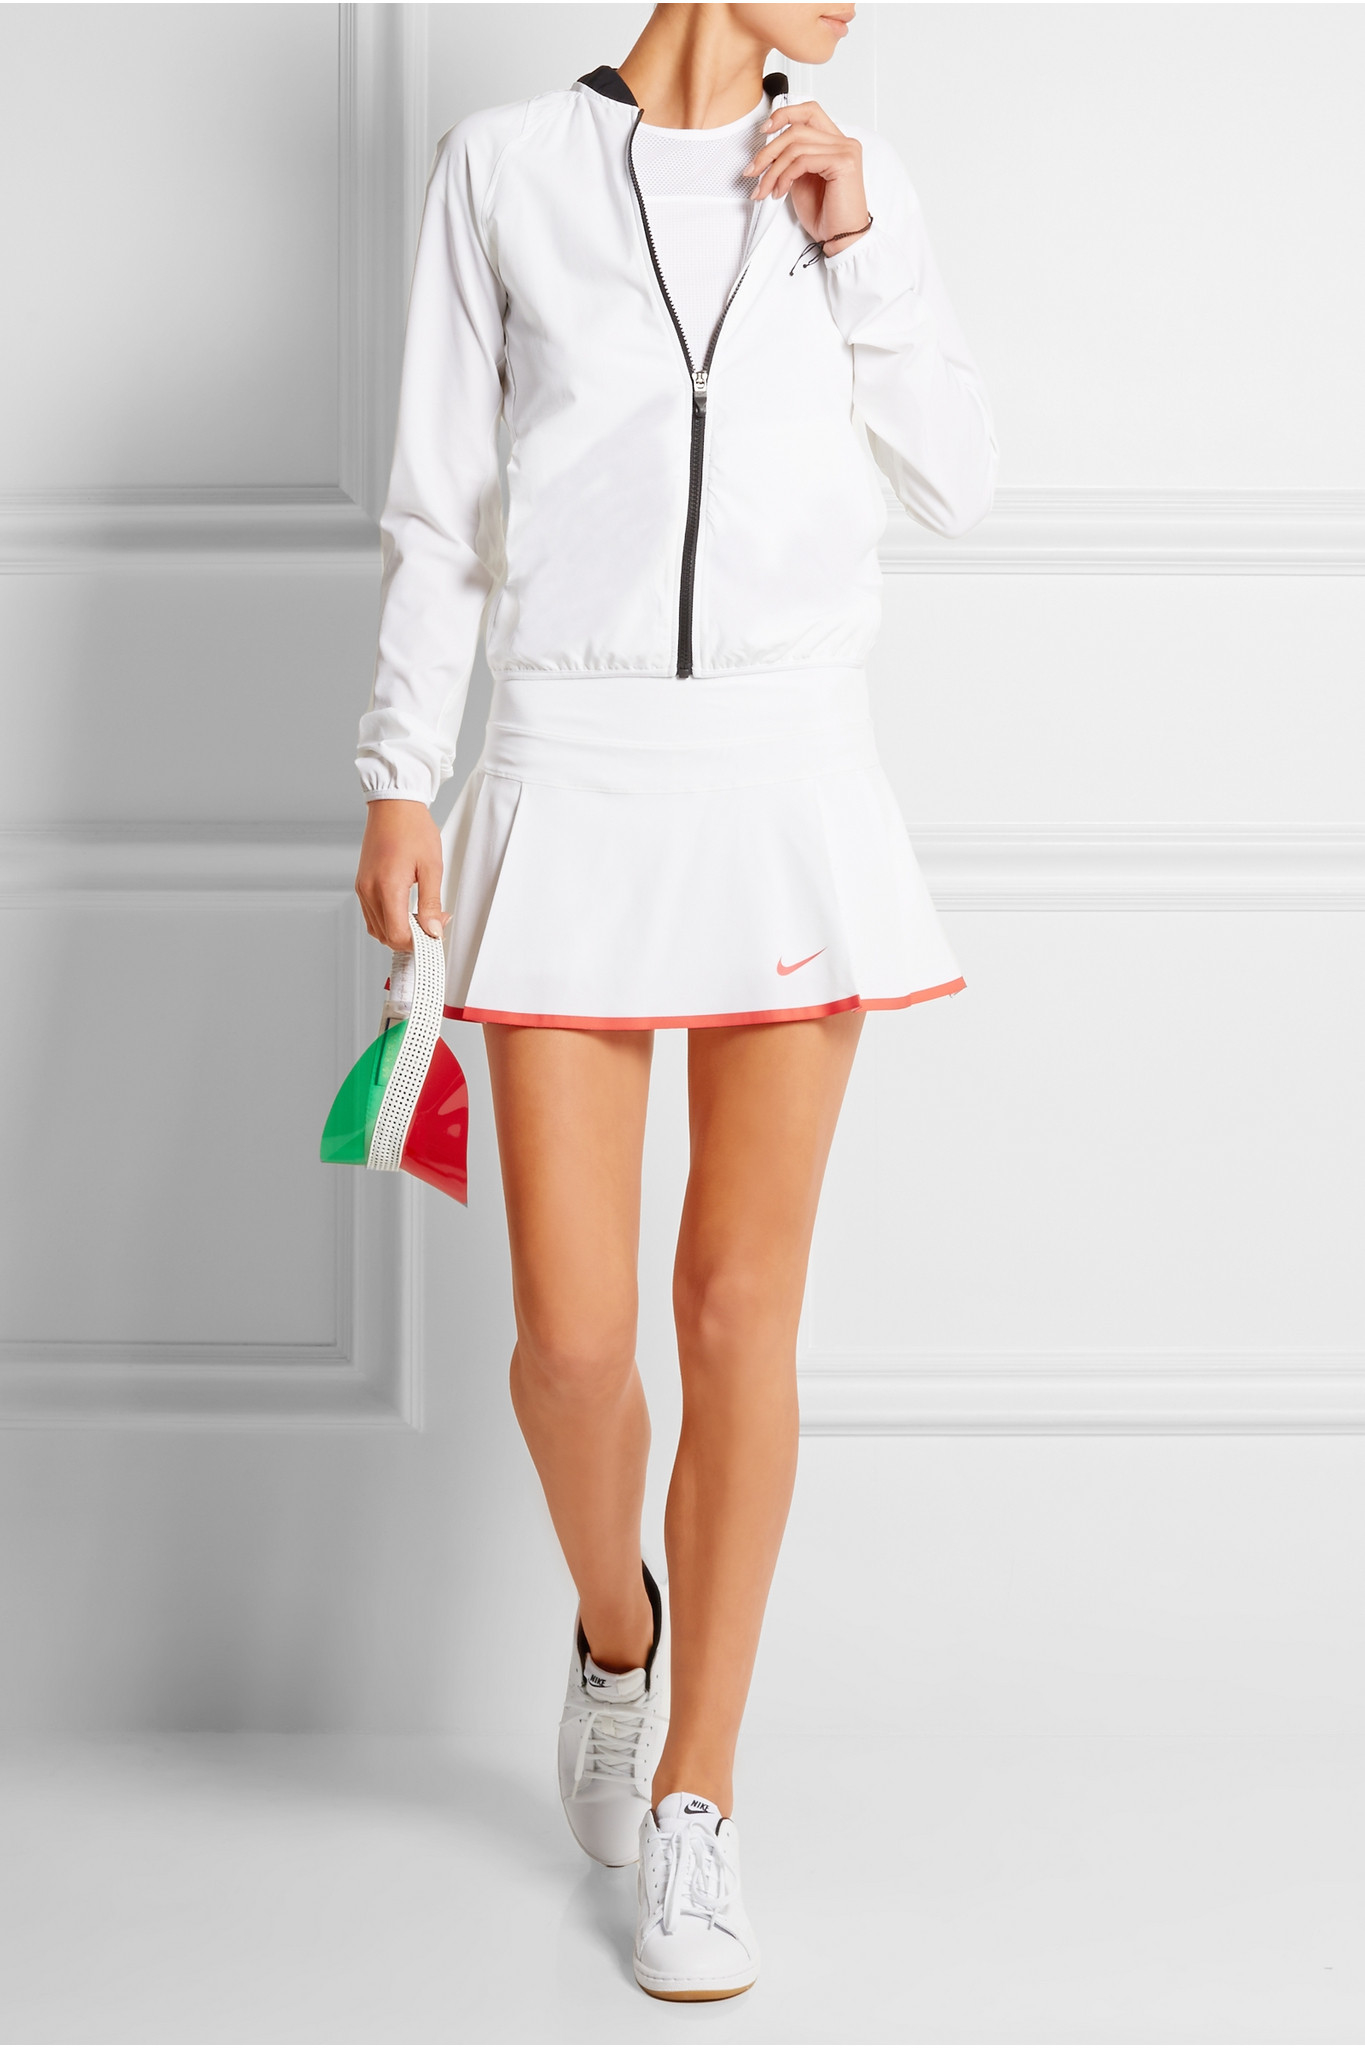 La Perla Tennis Shoes